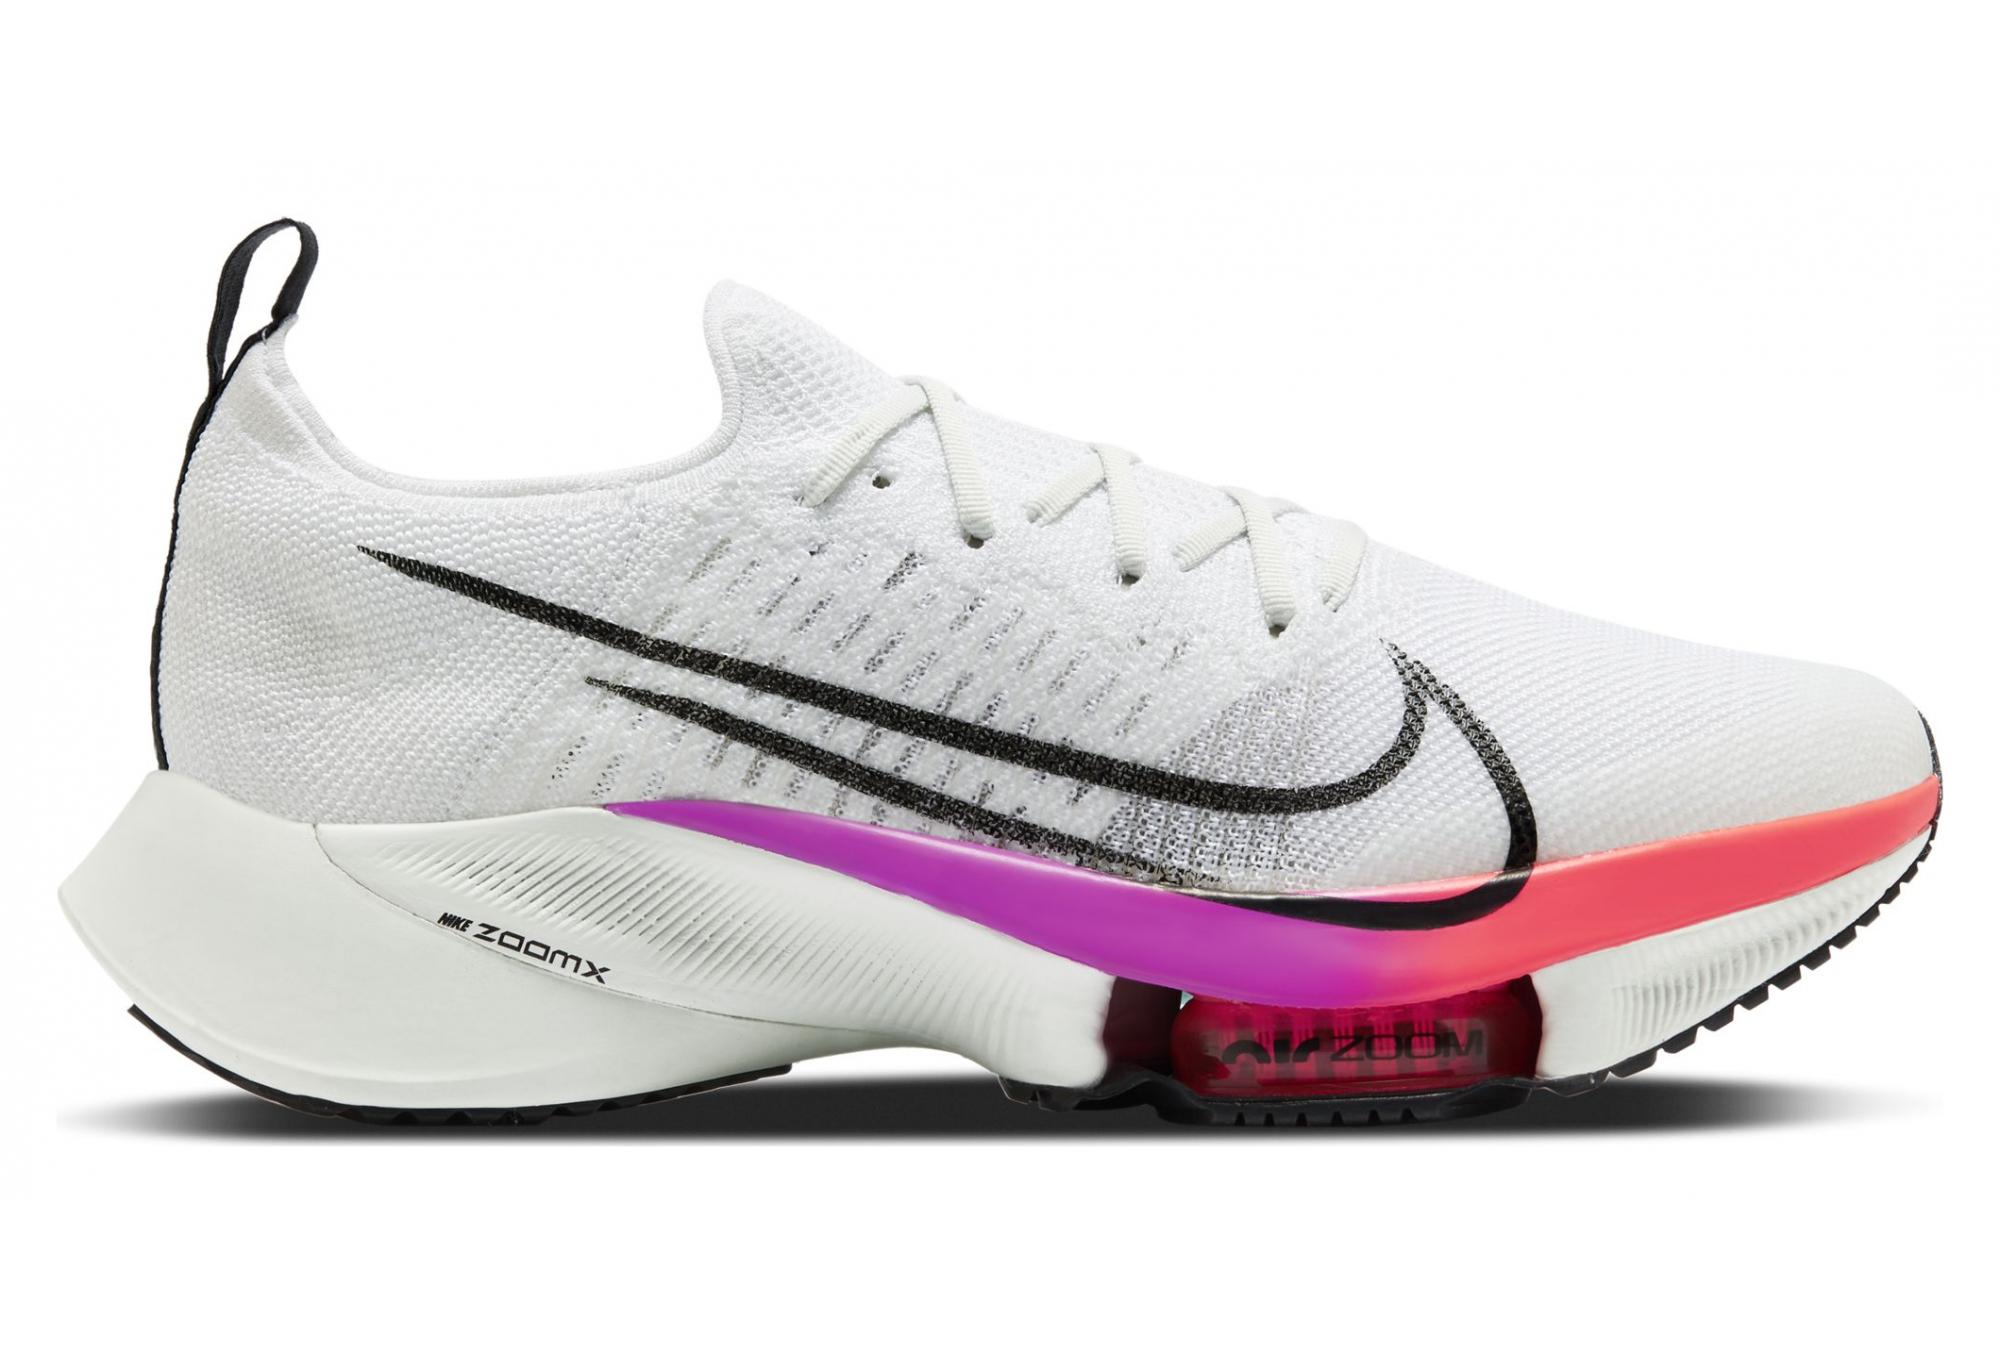 Chaussures de Running Nike Air Zoom Tempo Next% Blanc / Multi ...